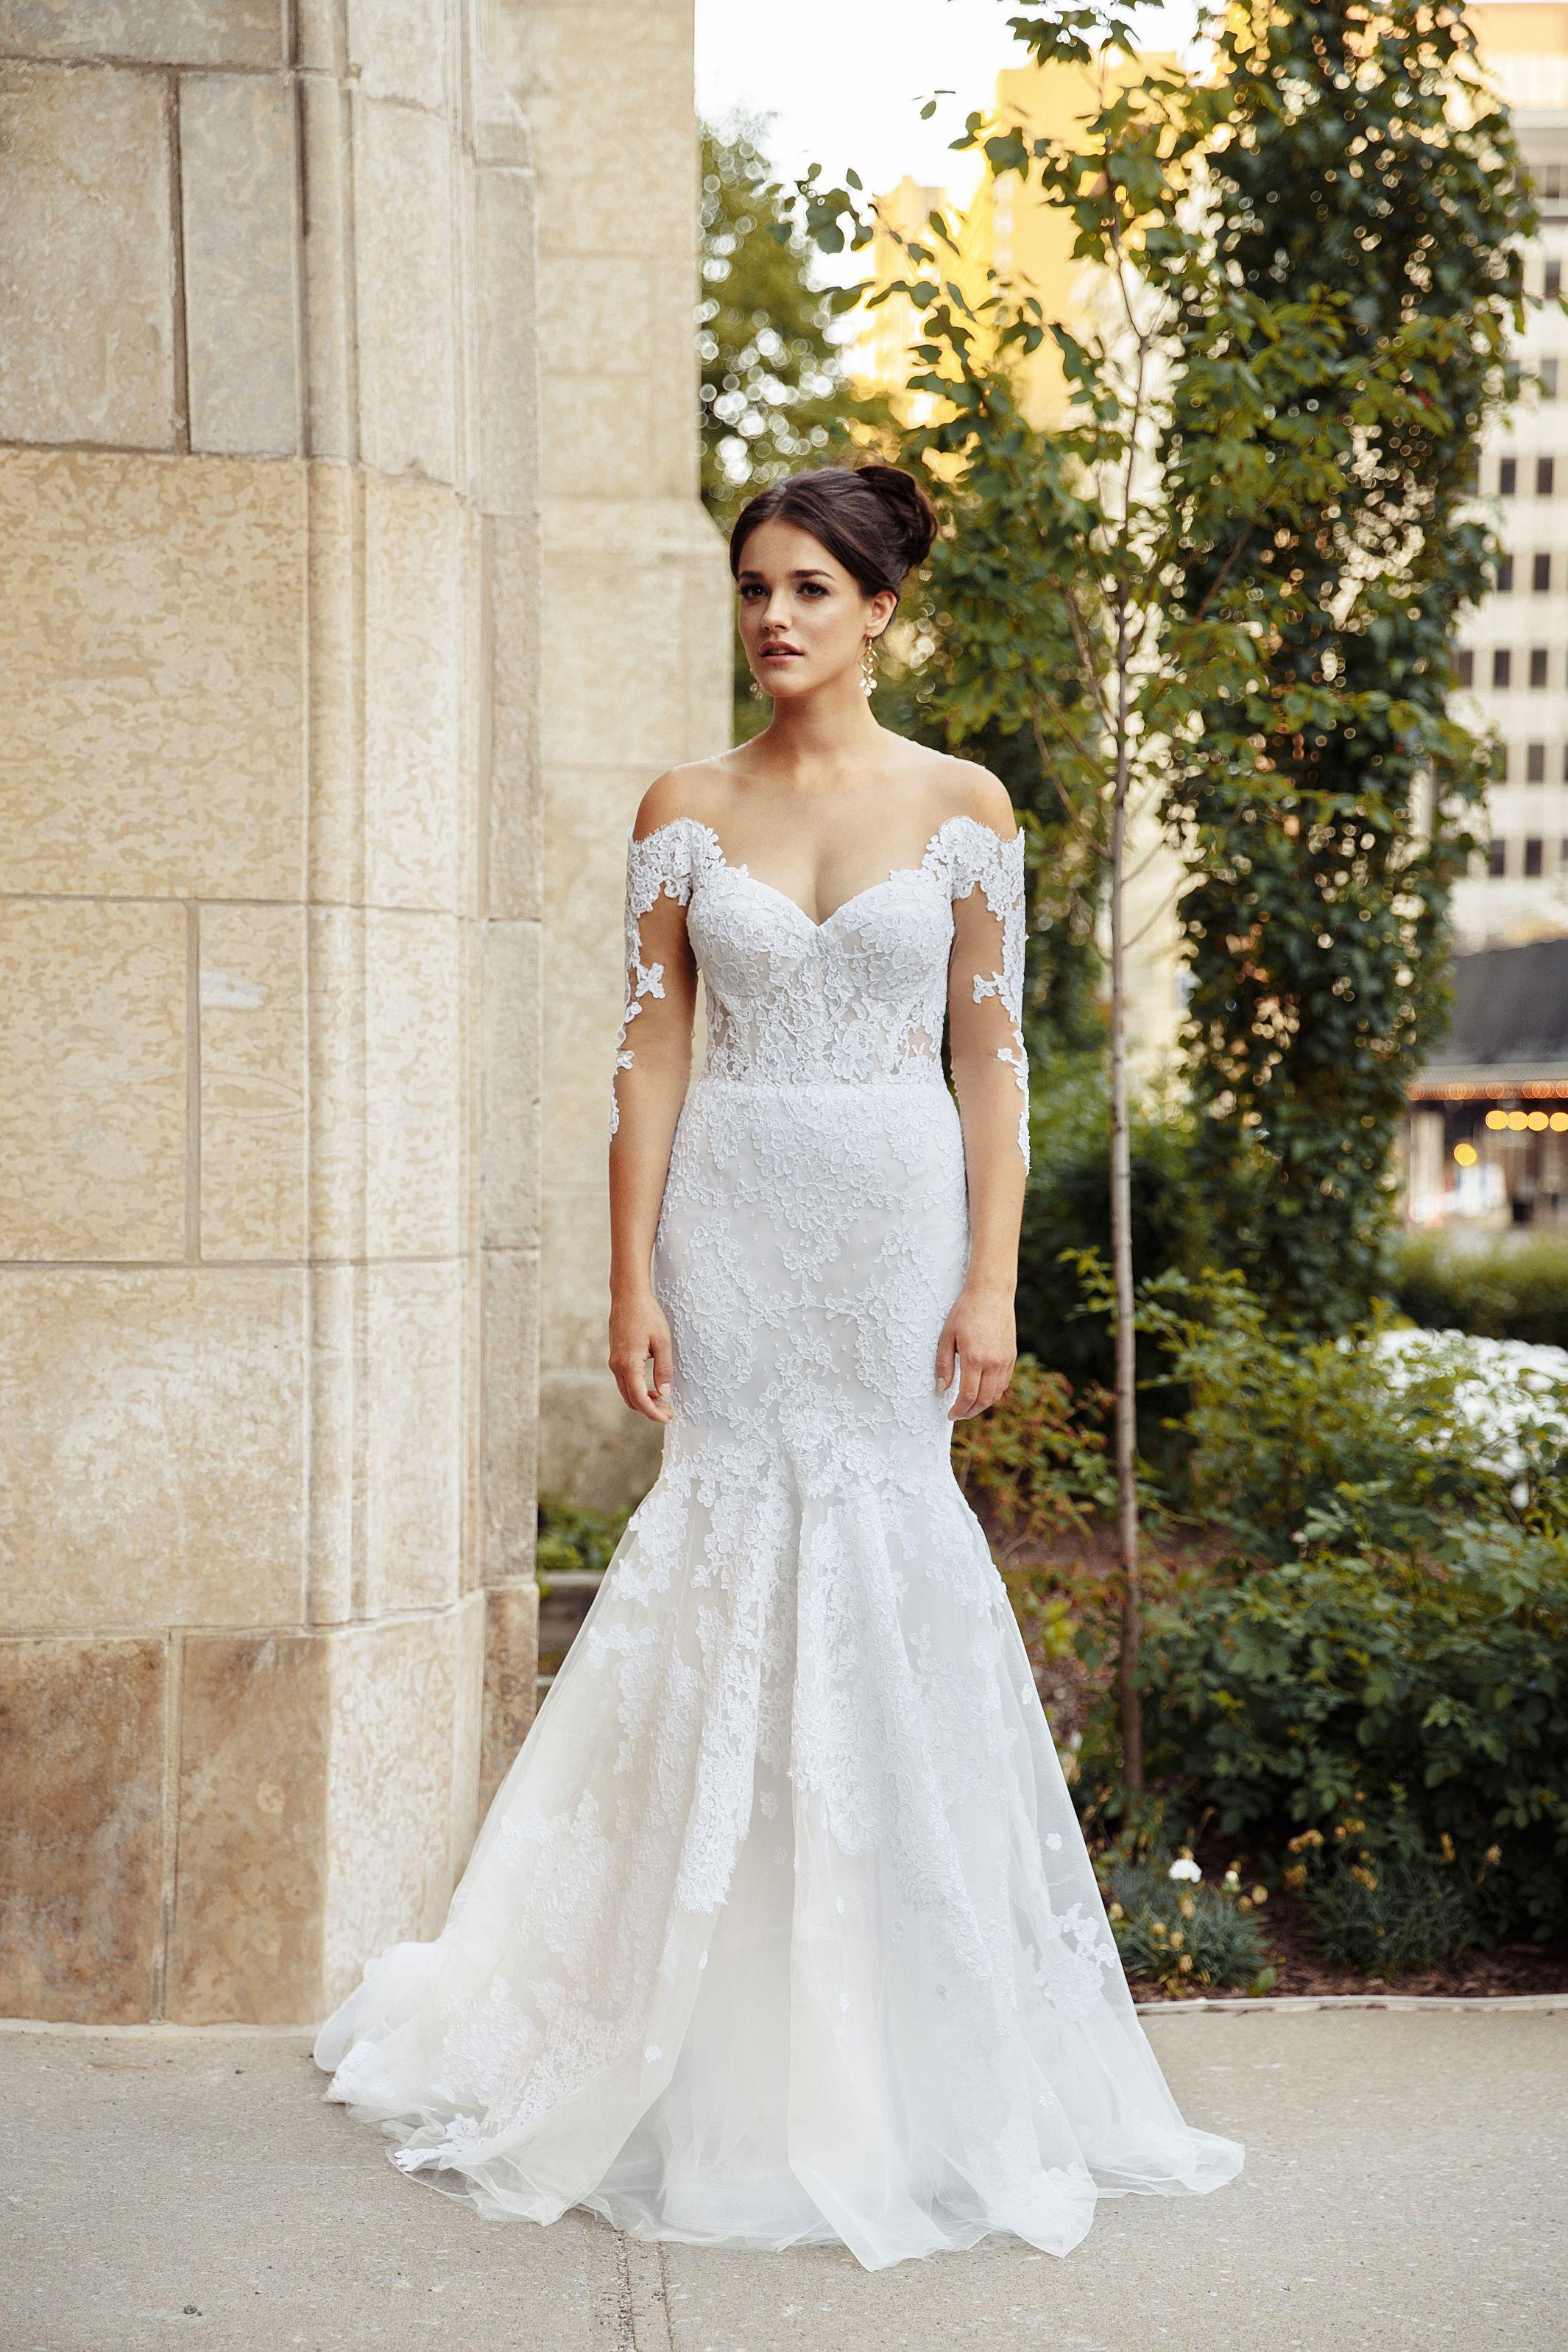 robe de mariee longues manches sirene montreal lilia haute couture robes de mariee